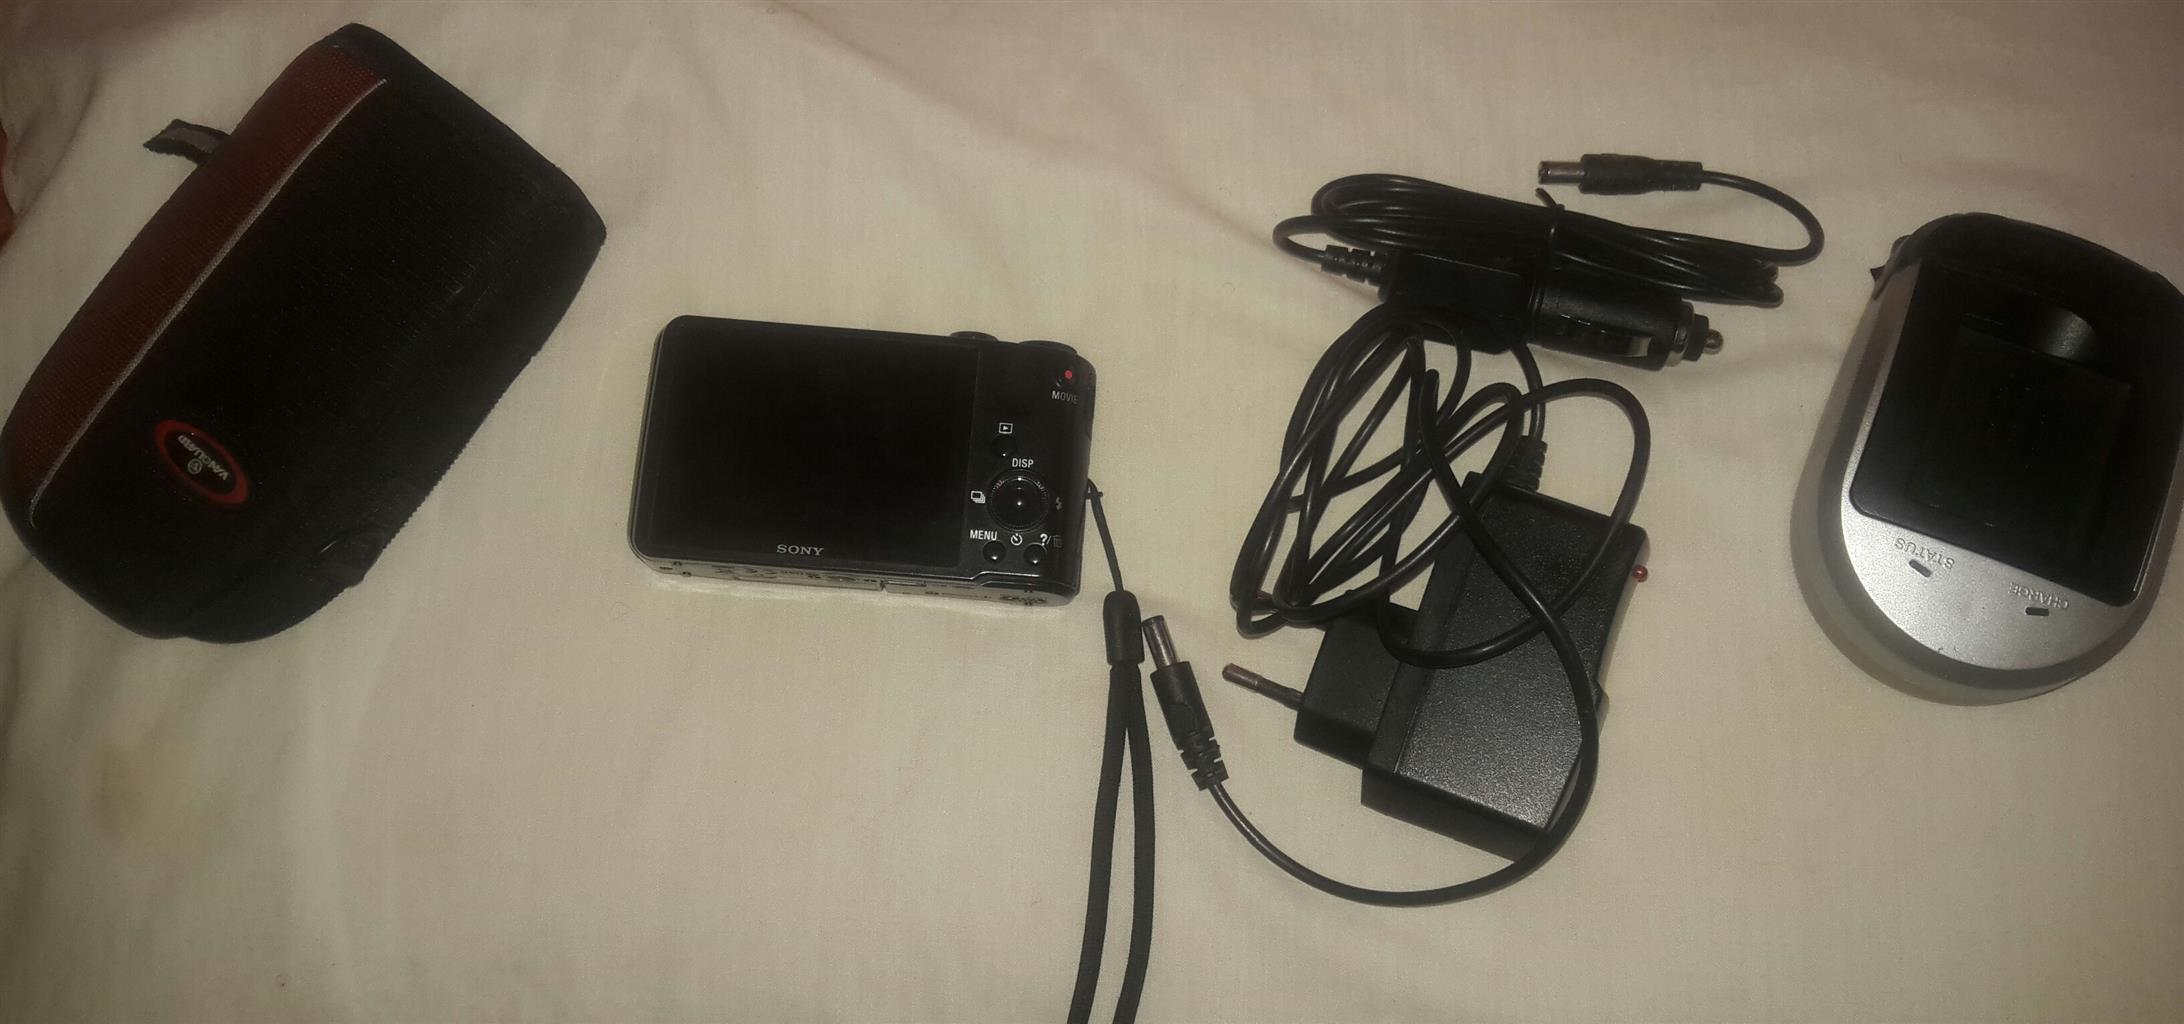 Sony Cyber-Shot DSC-HX7V 16.2 MP Exmor R CMOS